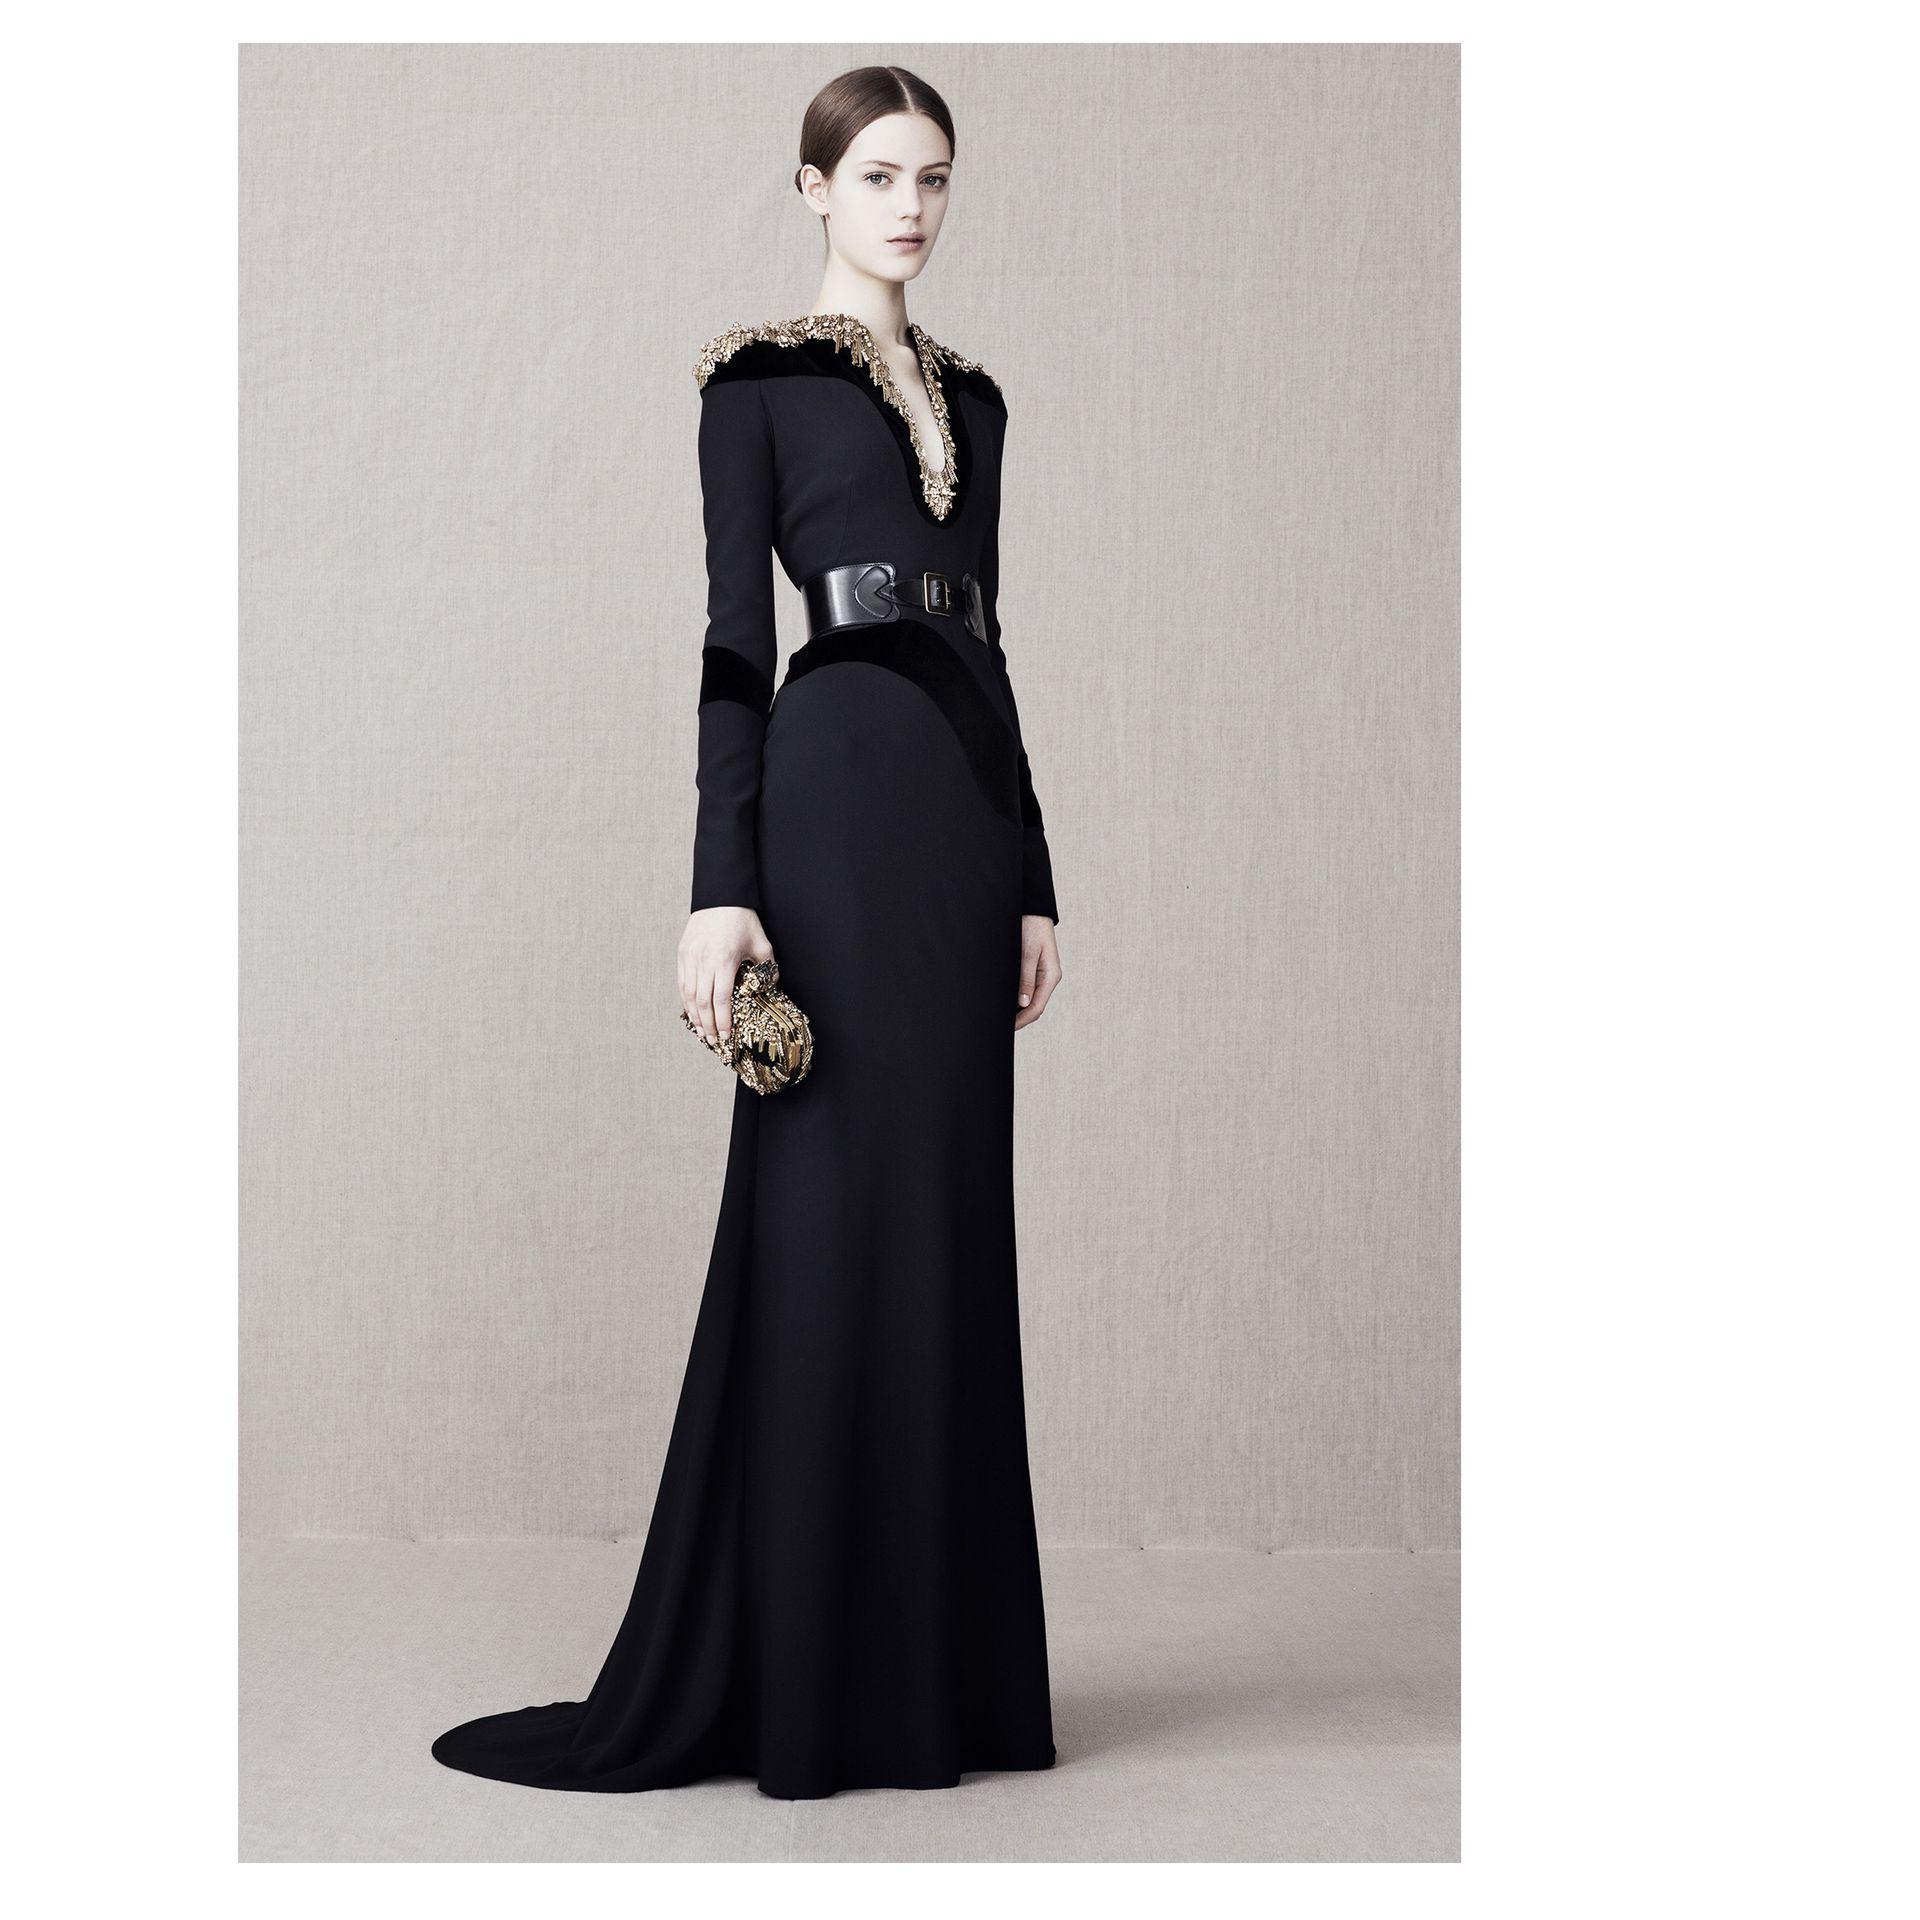 Lyst - Alexander Mcqueen Glory Embellished Floor Length Gown in Black